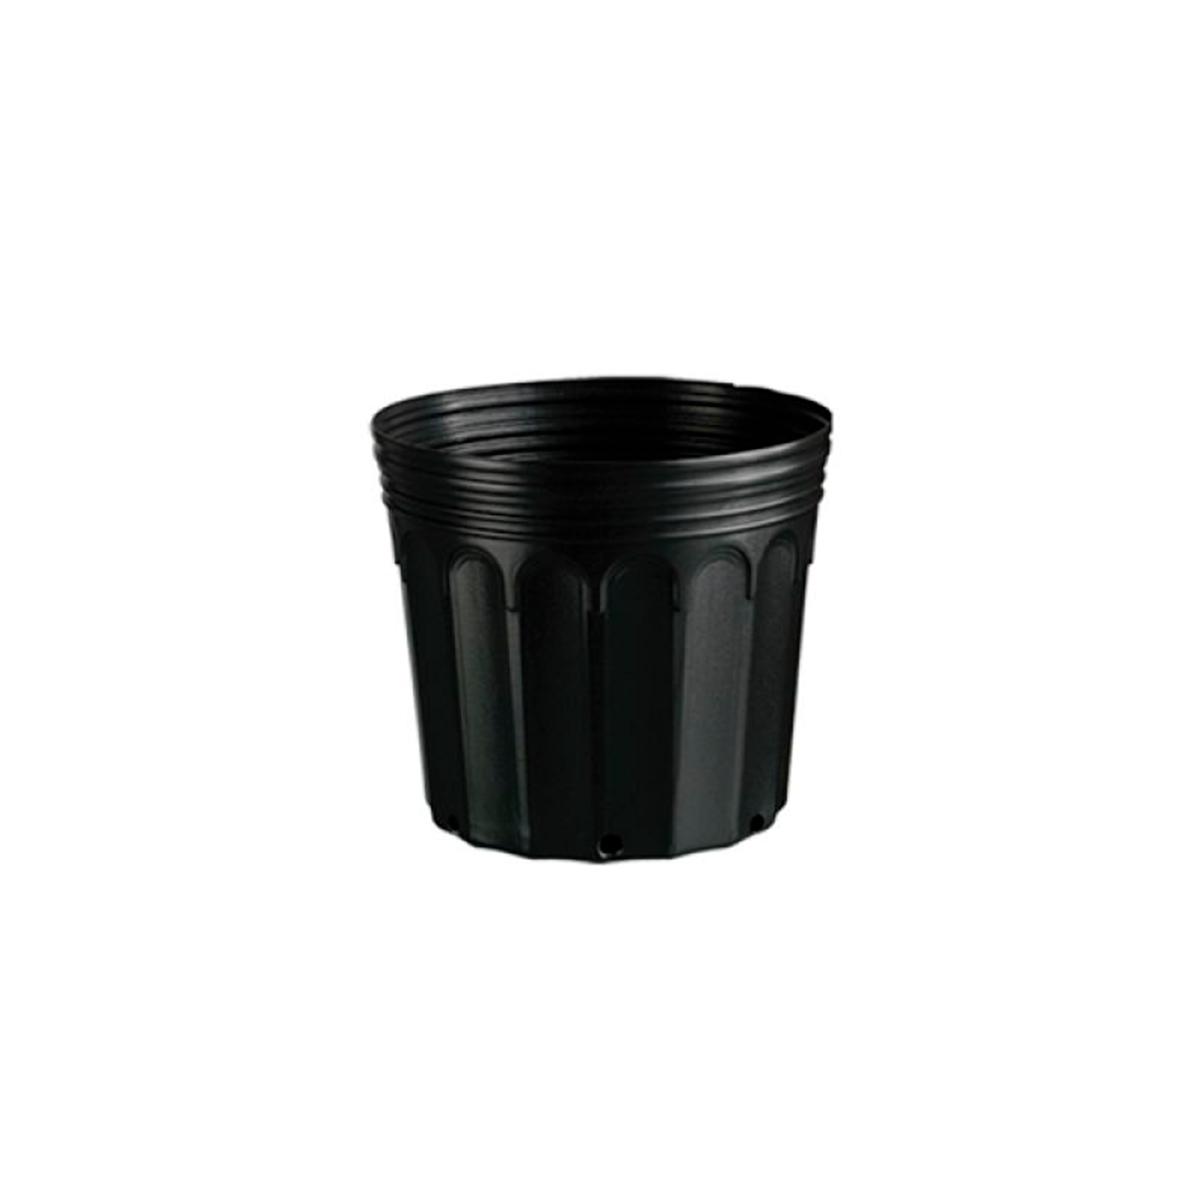 Kit 75 Embalagem Vaso para Mudas Plástico 3,6L